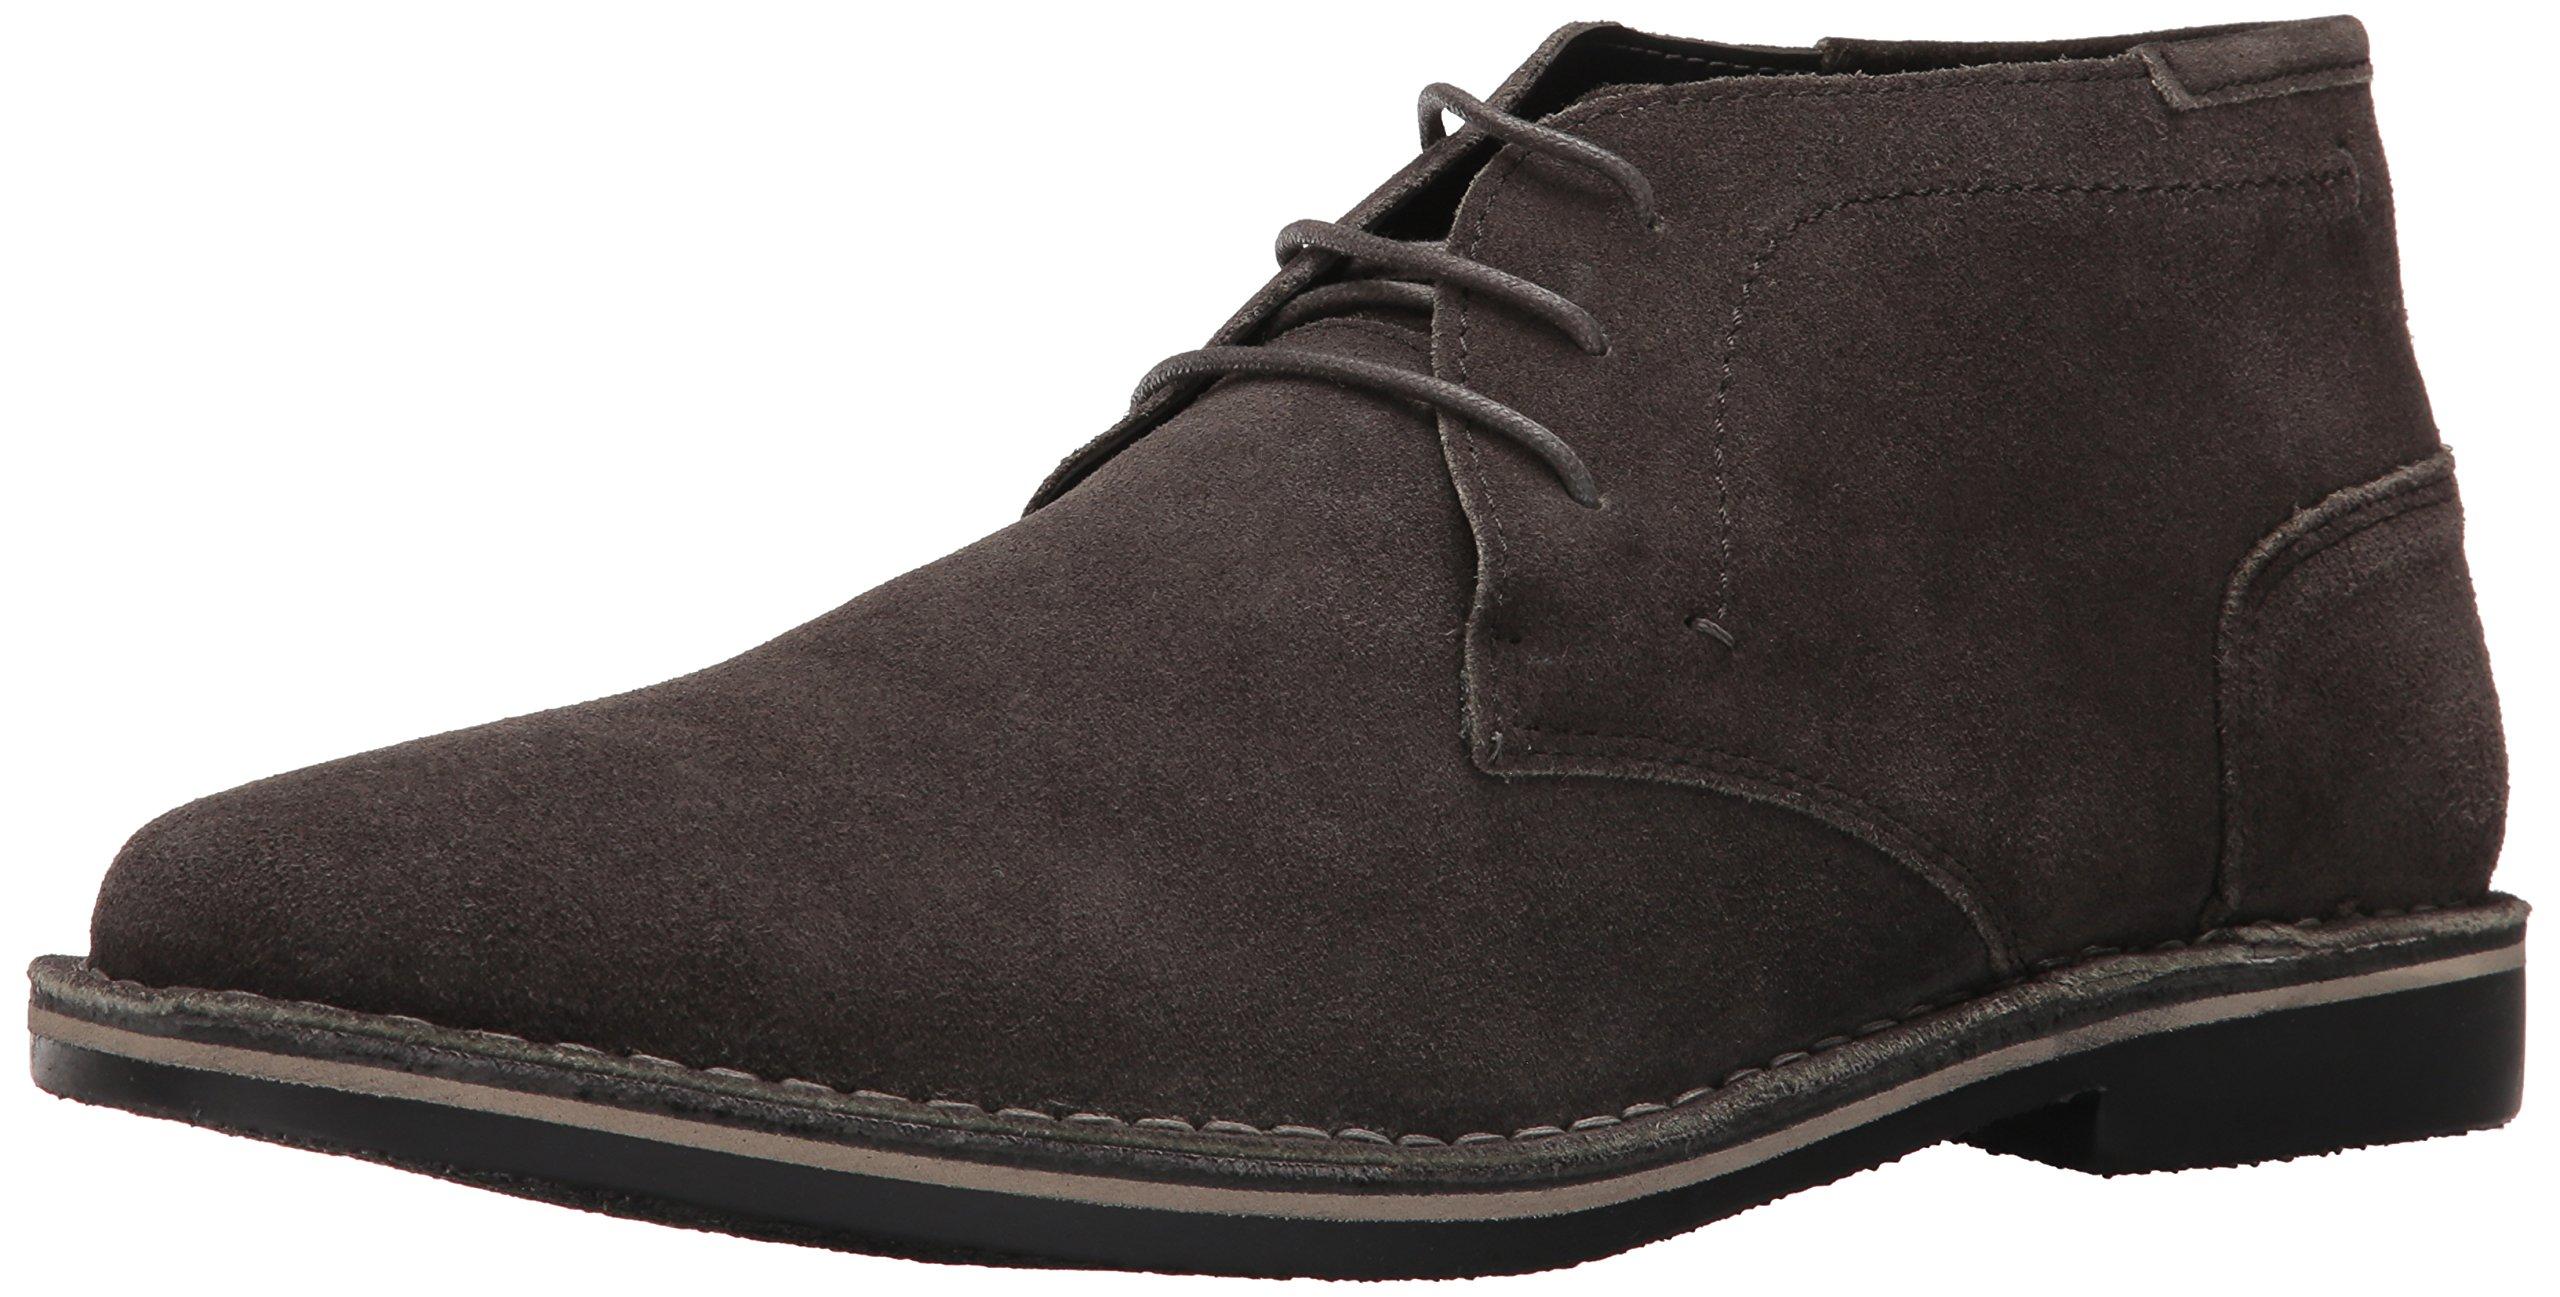 Steve Madden Men's Hacksaw Chukka Boot, Dark Grey Suede, 12 US/US Size Conversion M US